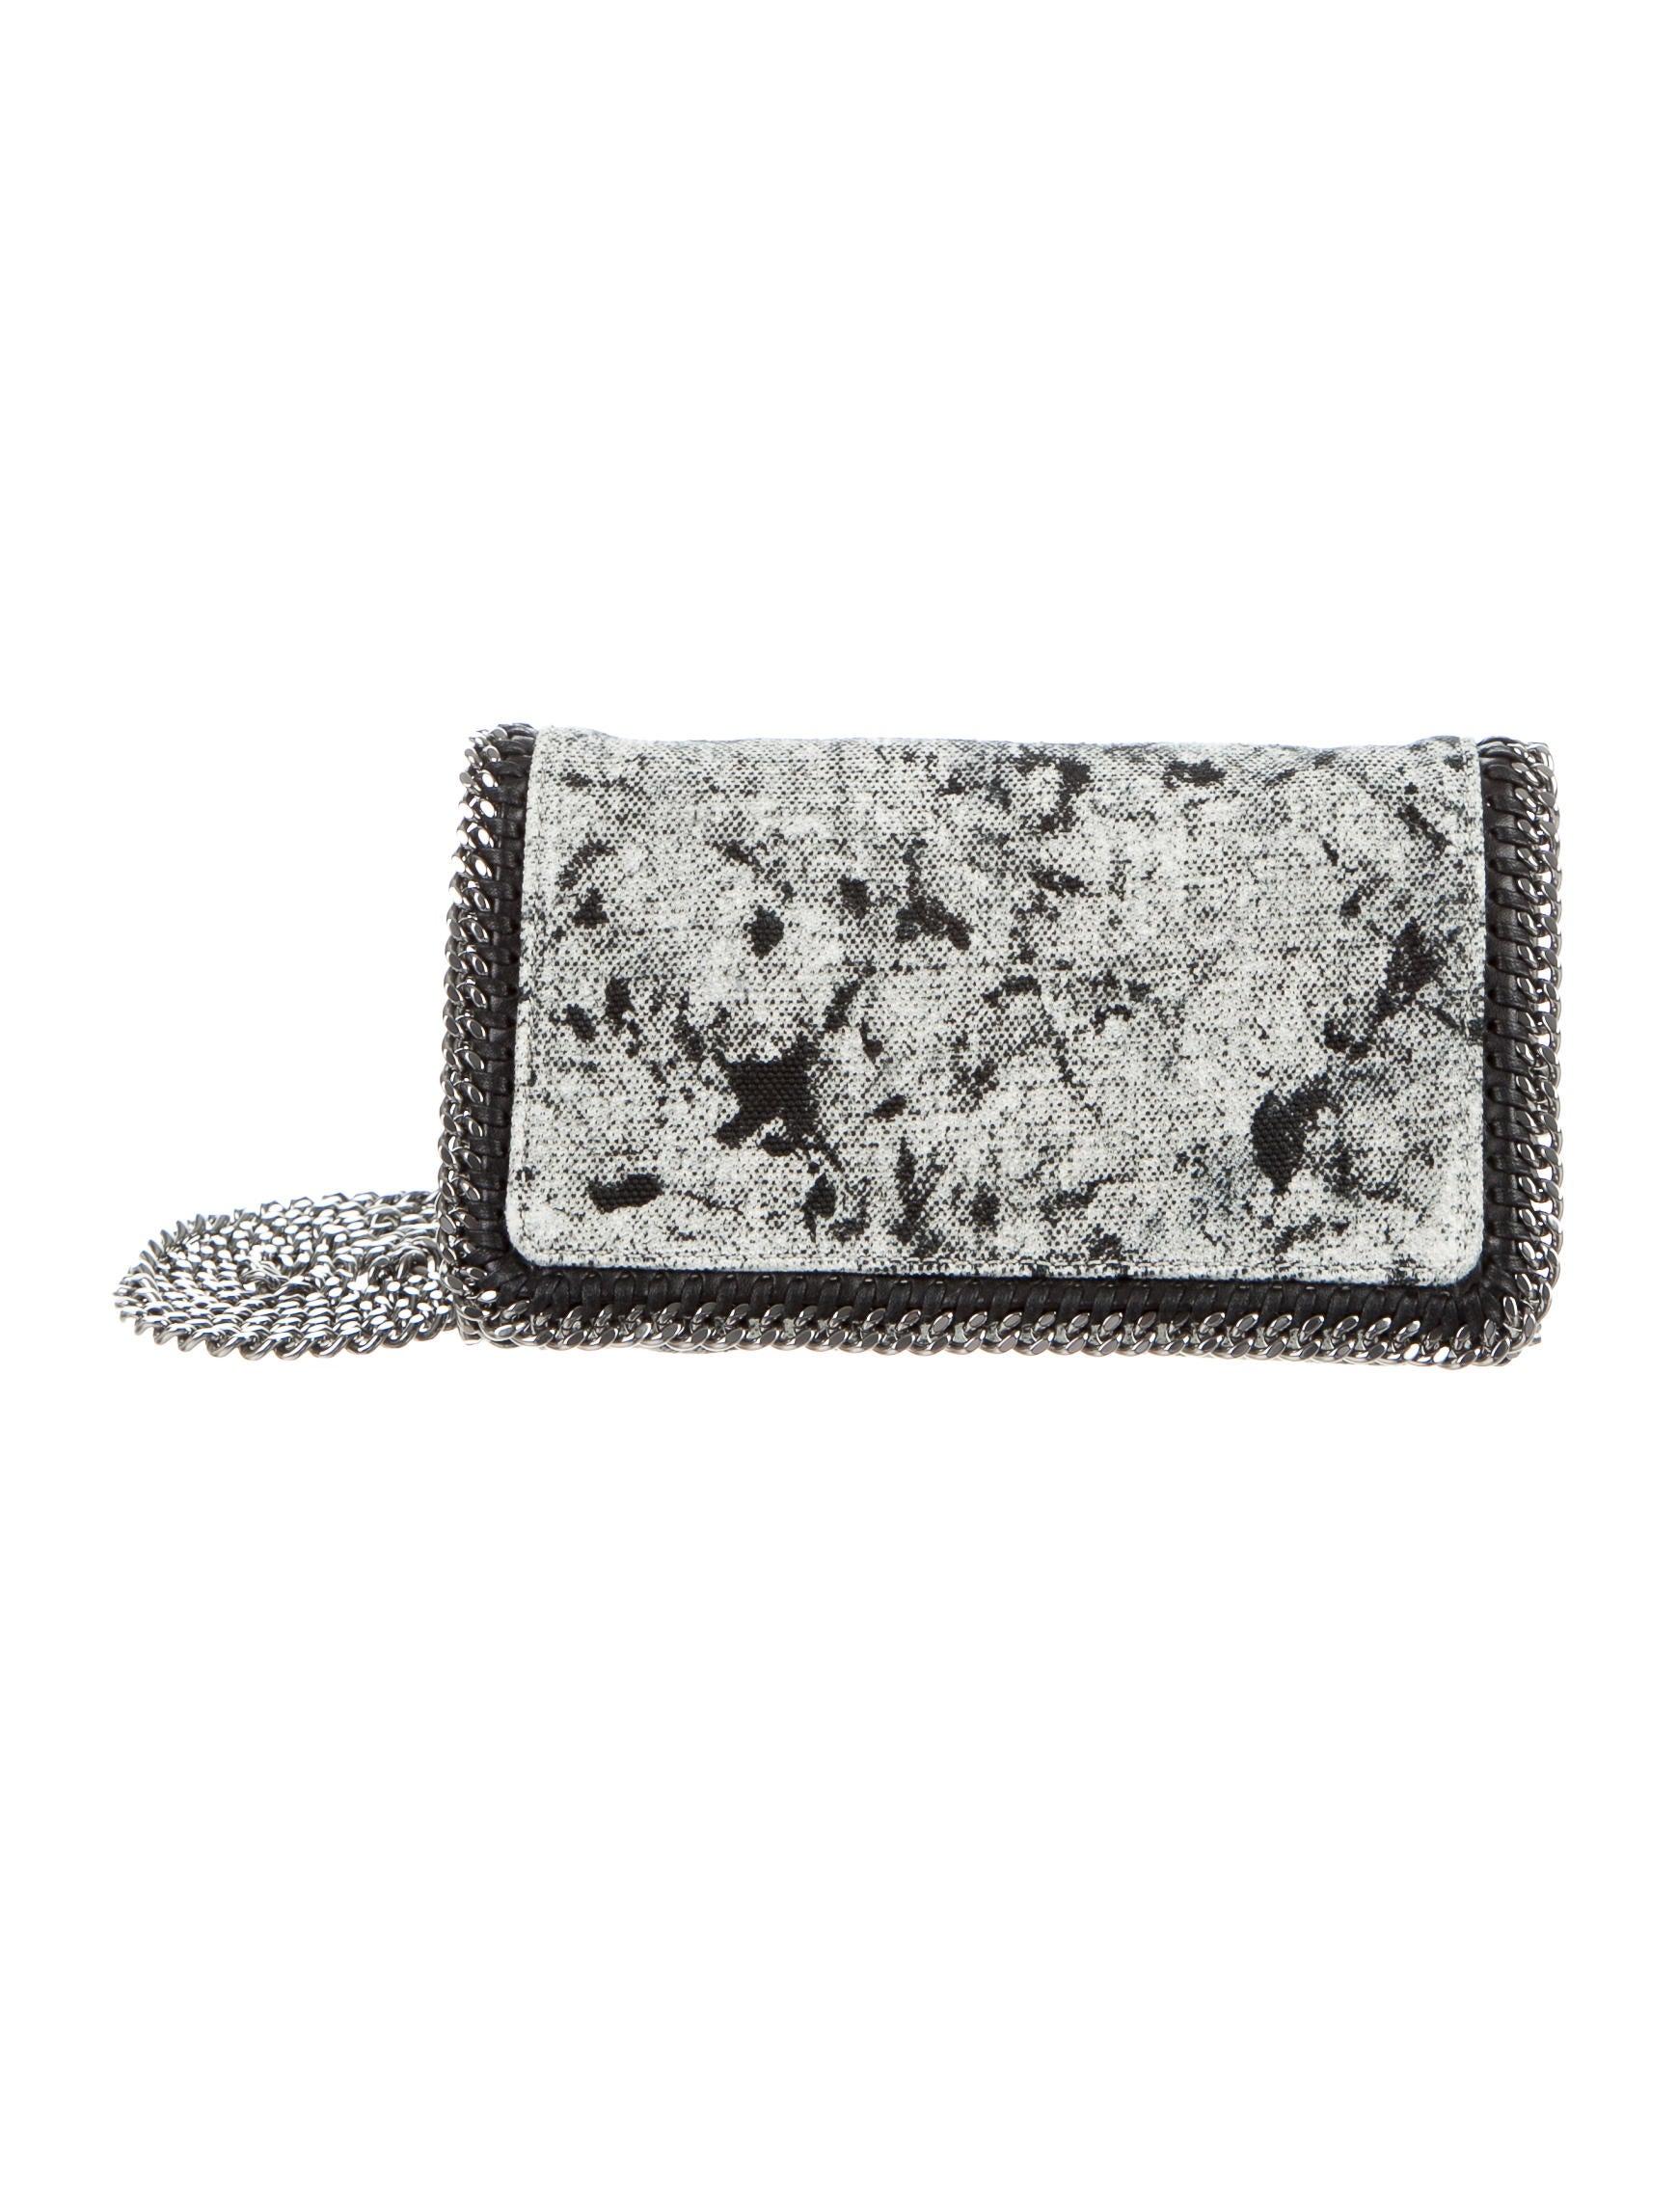 be22f02b3683 Stella McCartney Falabella Splash Canvas Crossbody Bag - Handbags ...